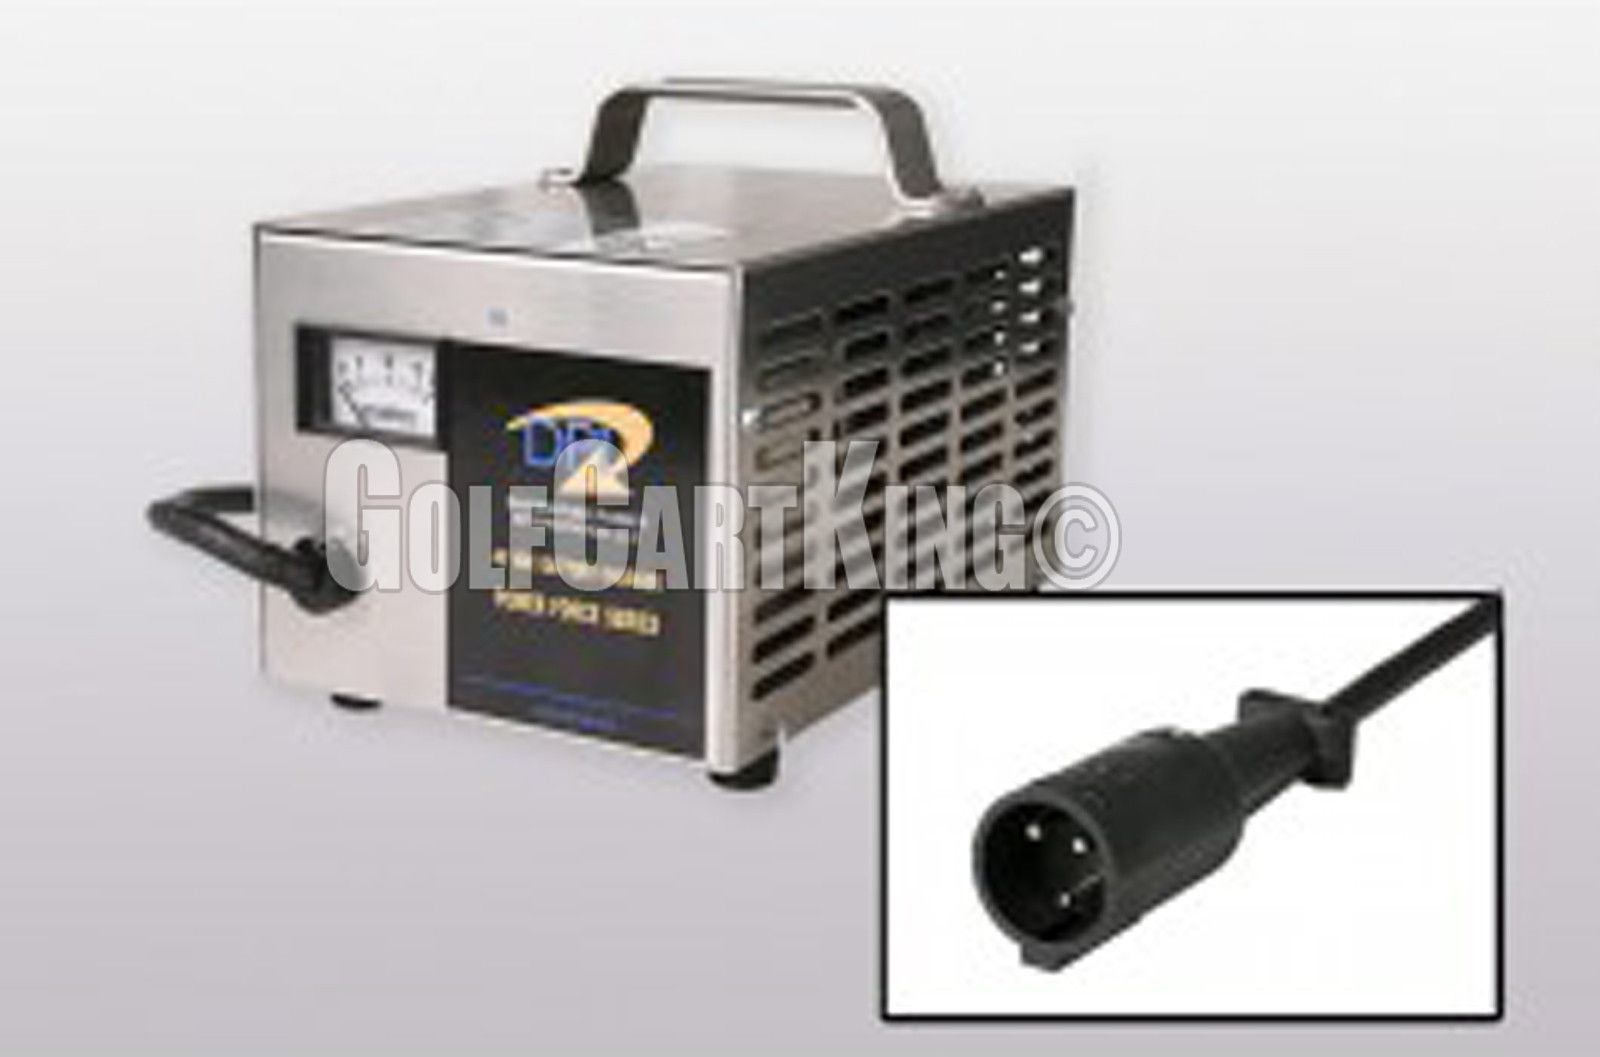 Club Car Powerdrive/IQ Golf Cart-48 Volt 15 Amp DPI Battery Charger-3 Pin  Round